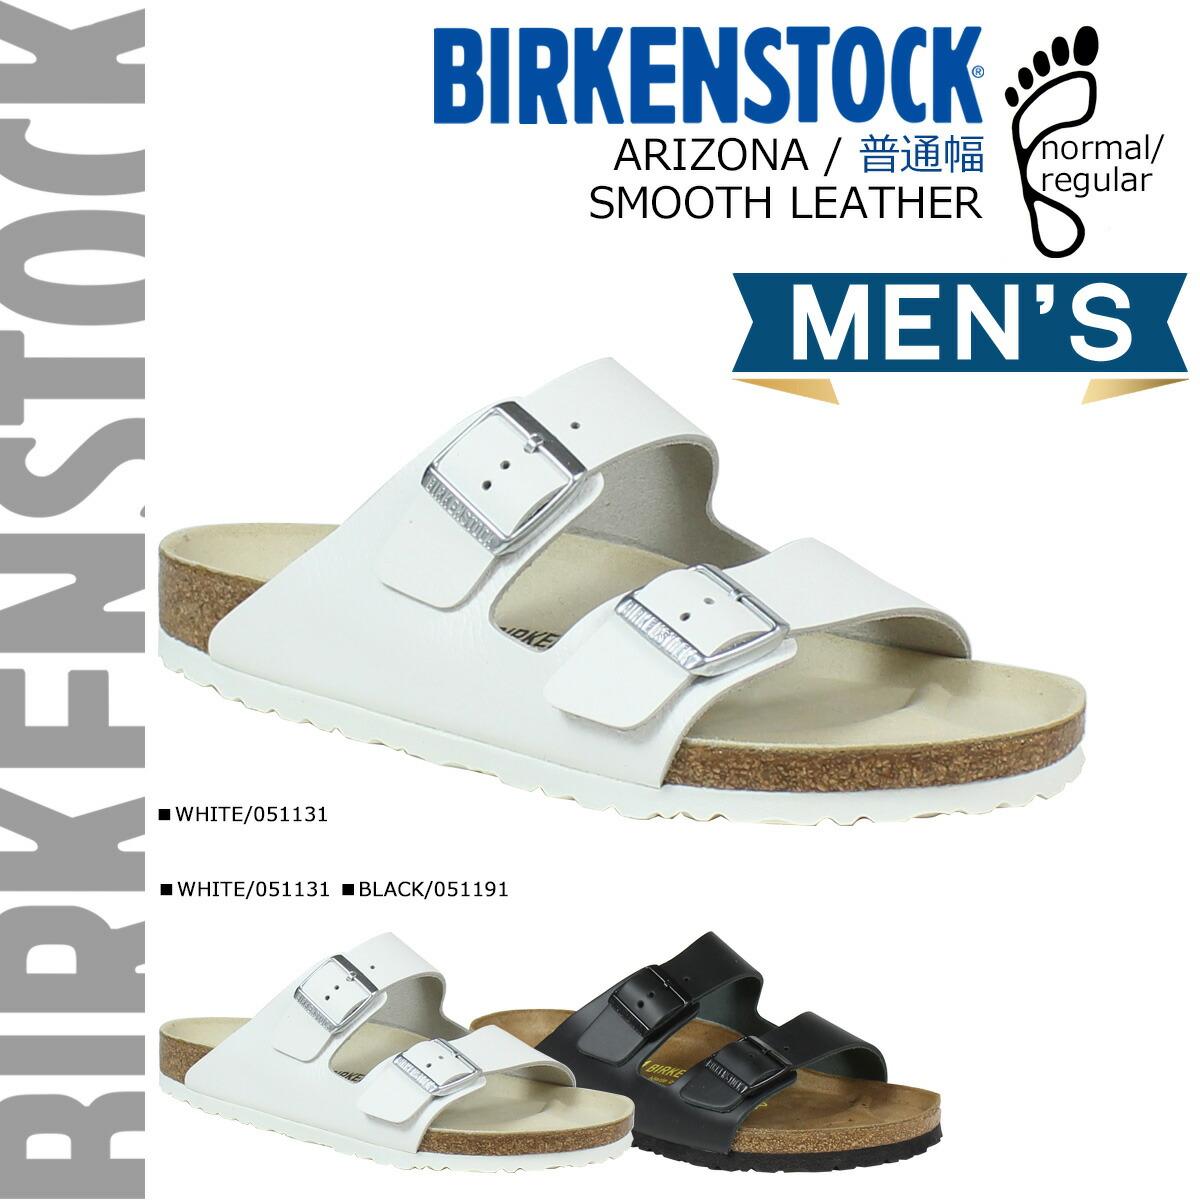 16a5a8e370b8 ALLSPORTS   SOLD OUT  BIRKENSTOCK-Birkenstock Arizona vilken Sandals ...